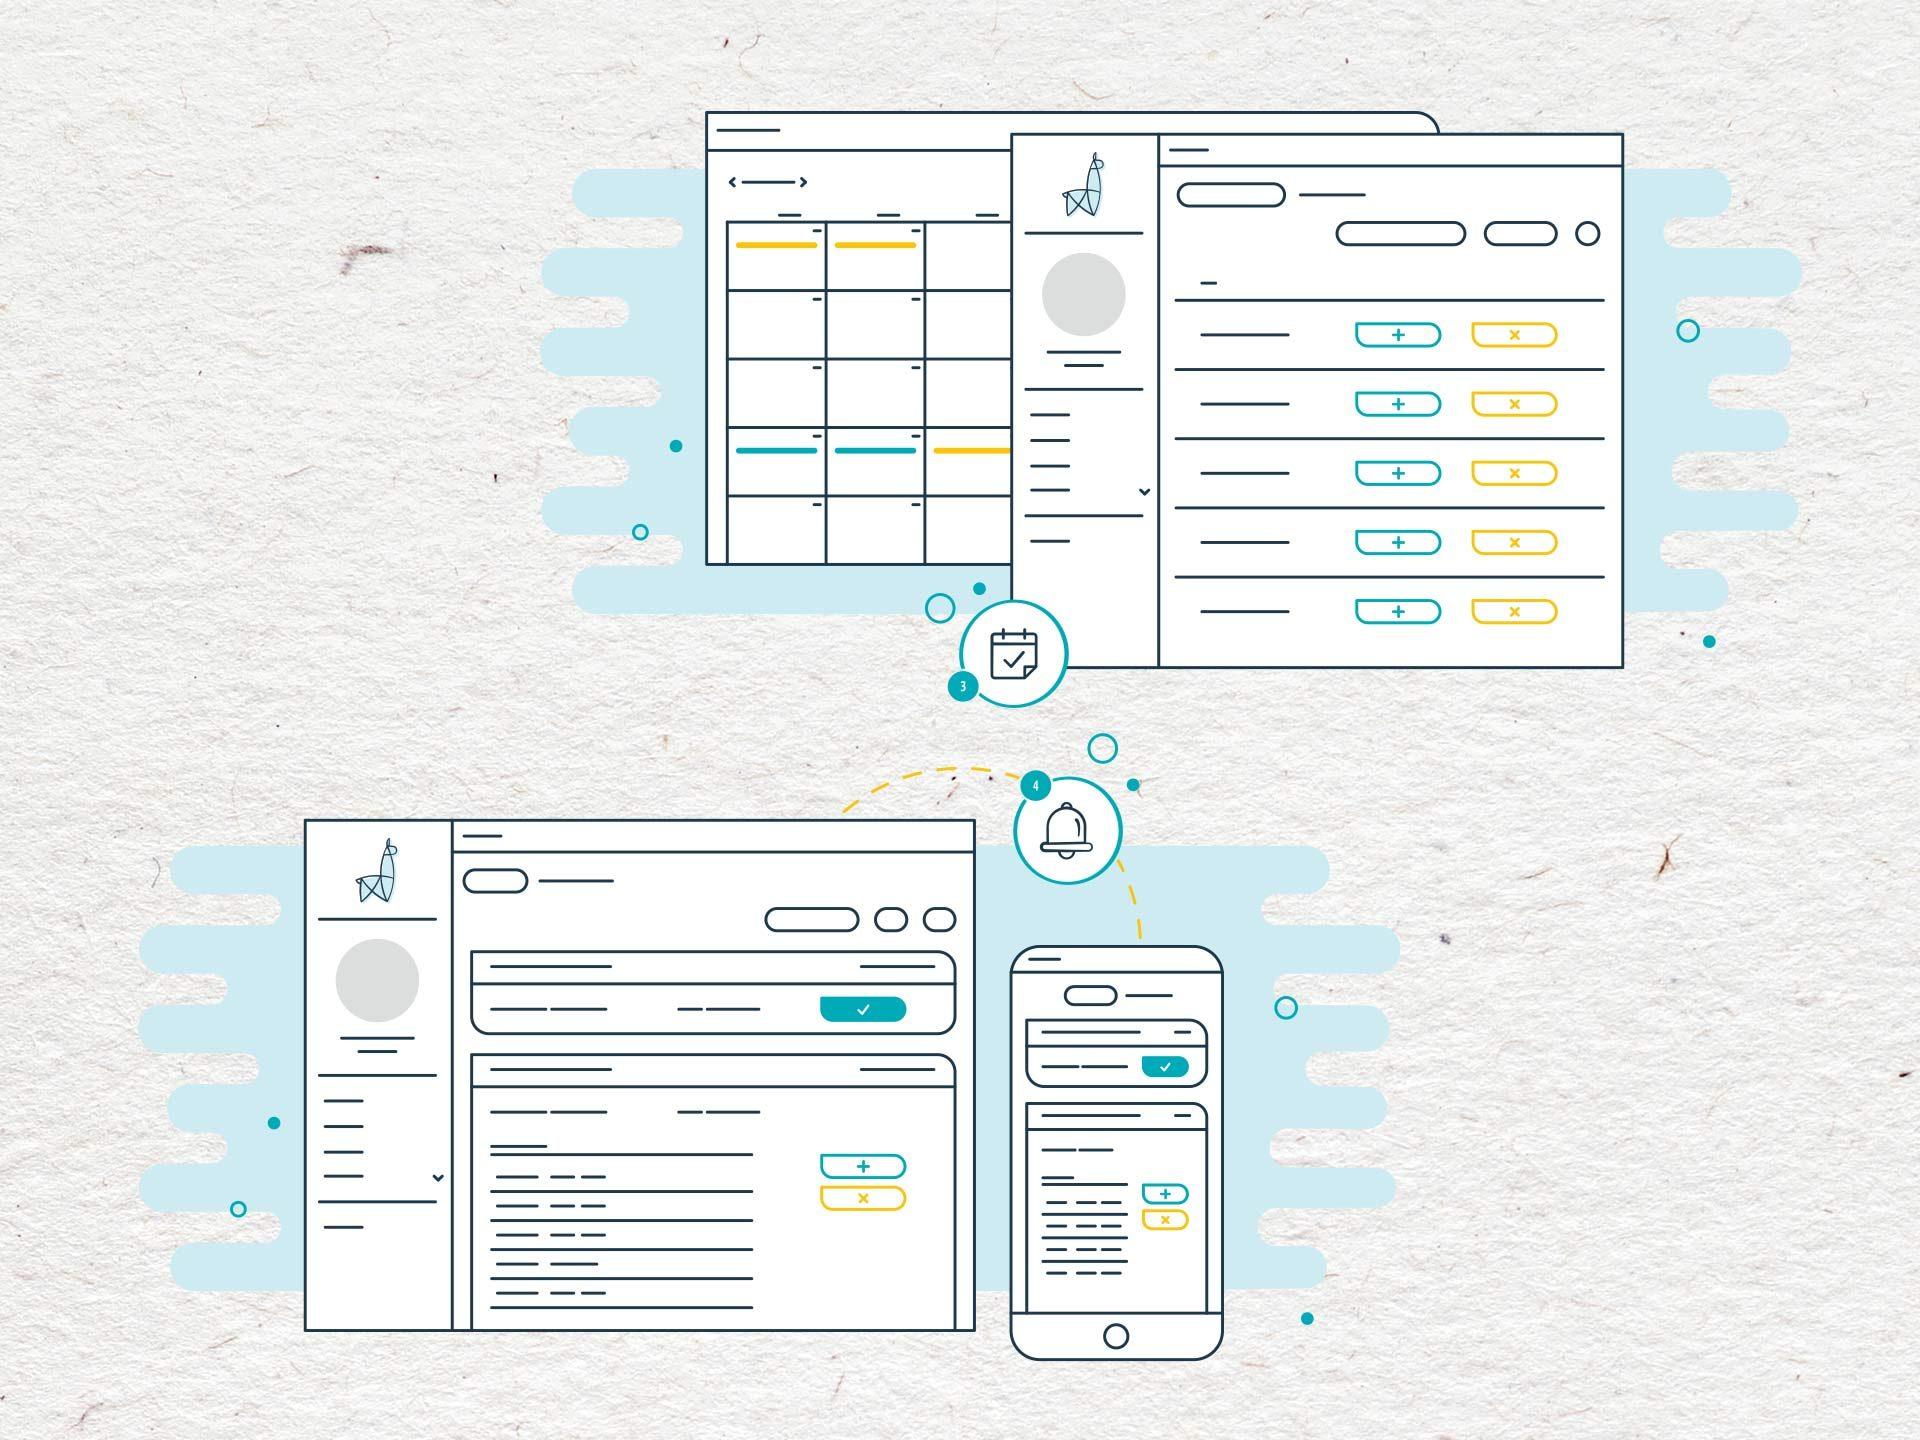 Y5 Creative Case Studies 2017 Infographic LlamaLink